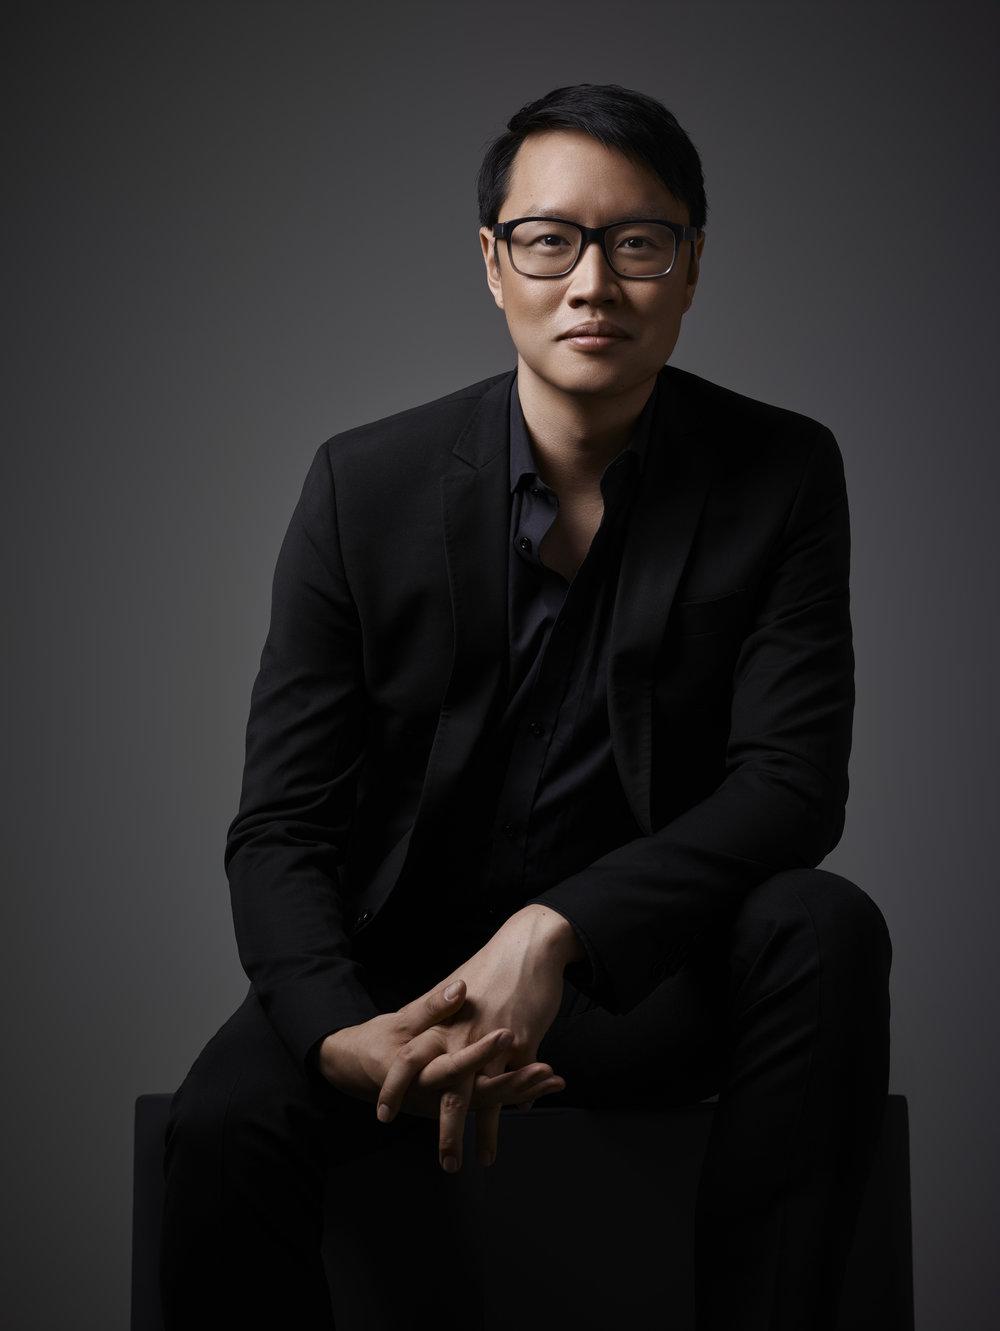 Phil Chiu